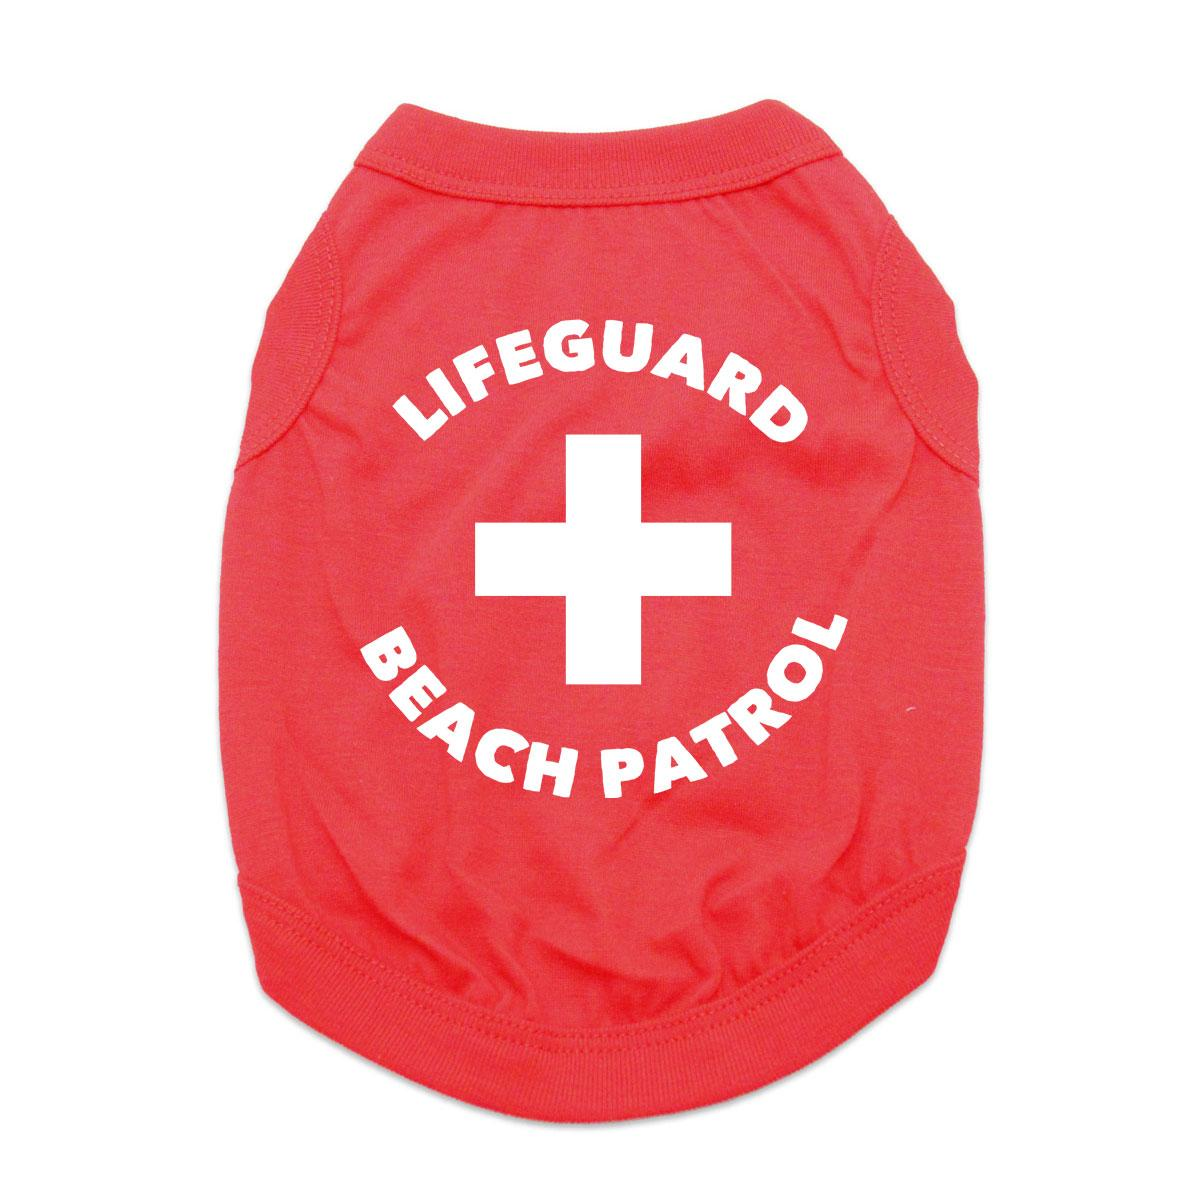 f83a2f92d3c1 Lifeguard Beach Patrol Dog Shirt - Red | BaxterBoo